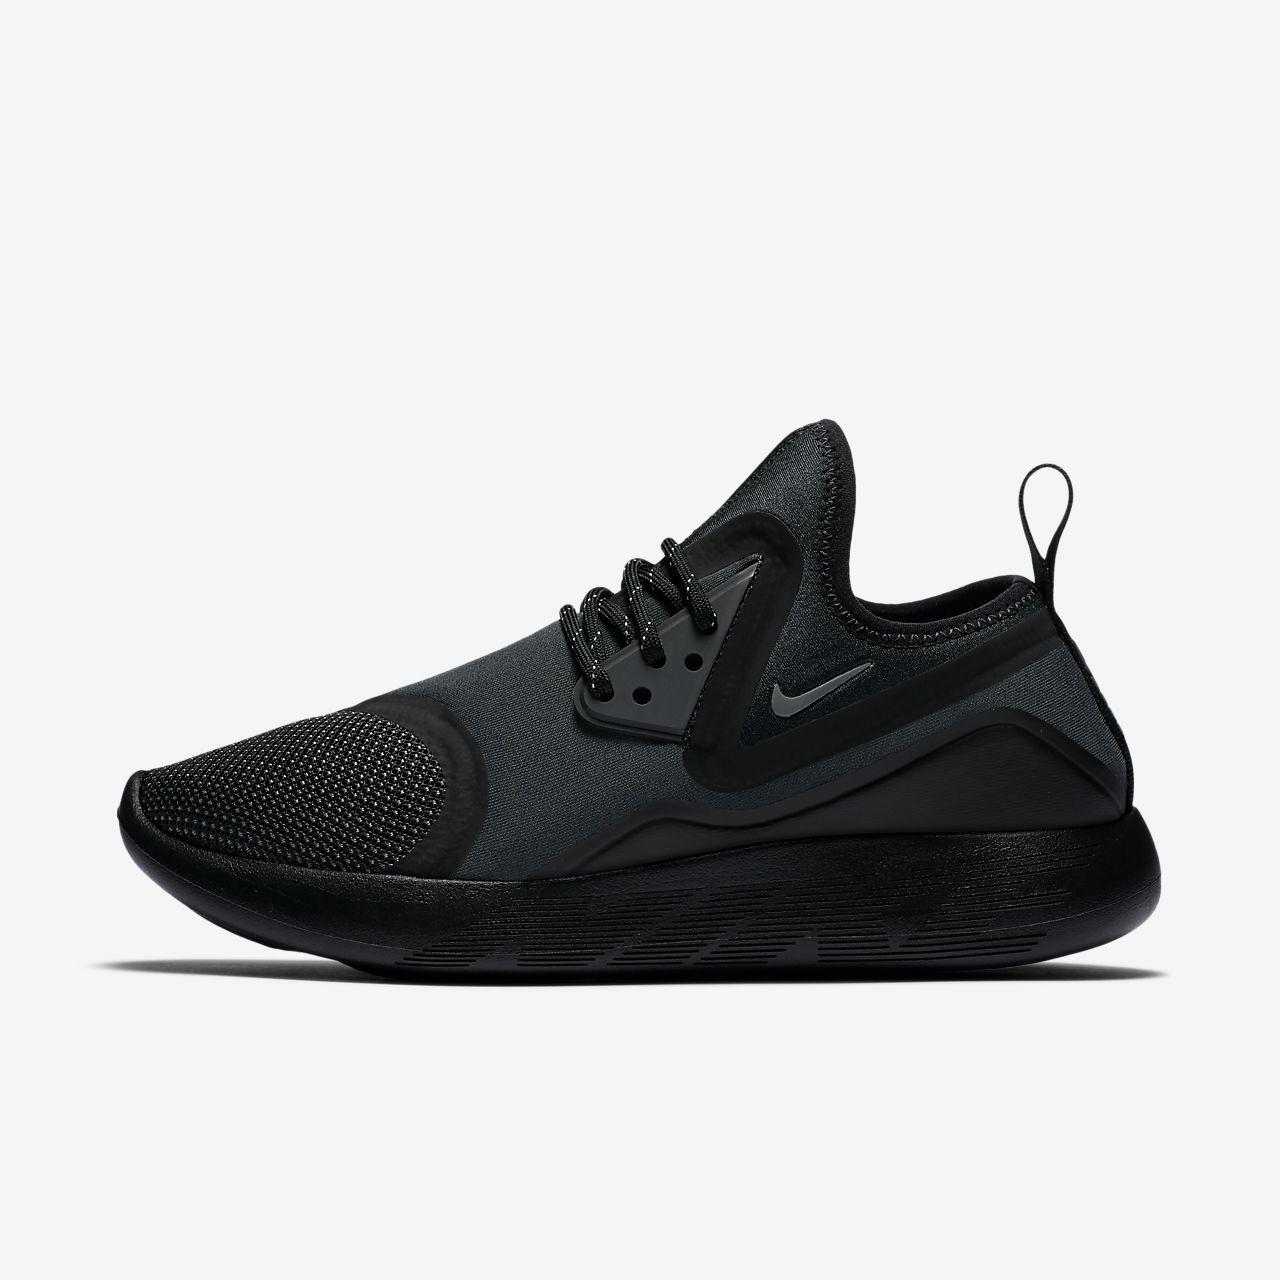 Nike da donna lunarcharge Essential Scarpe Sportive Nere 923620 001